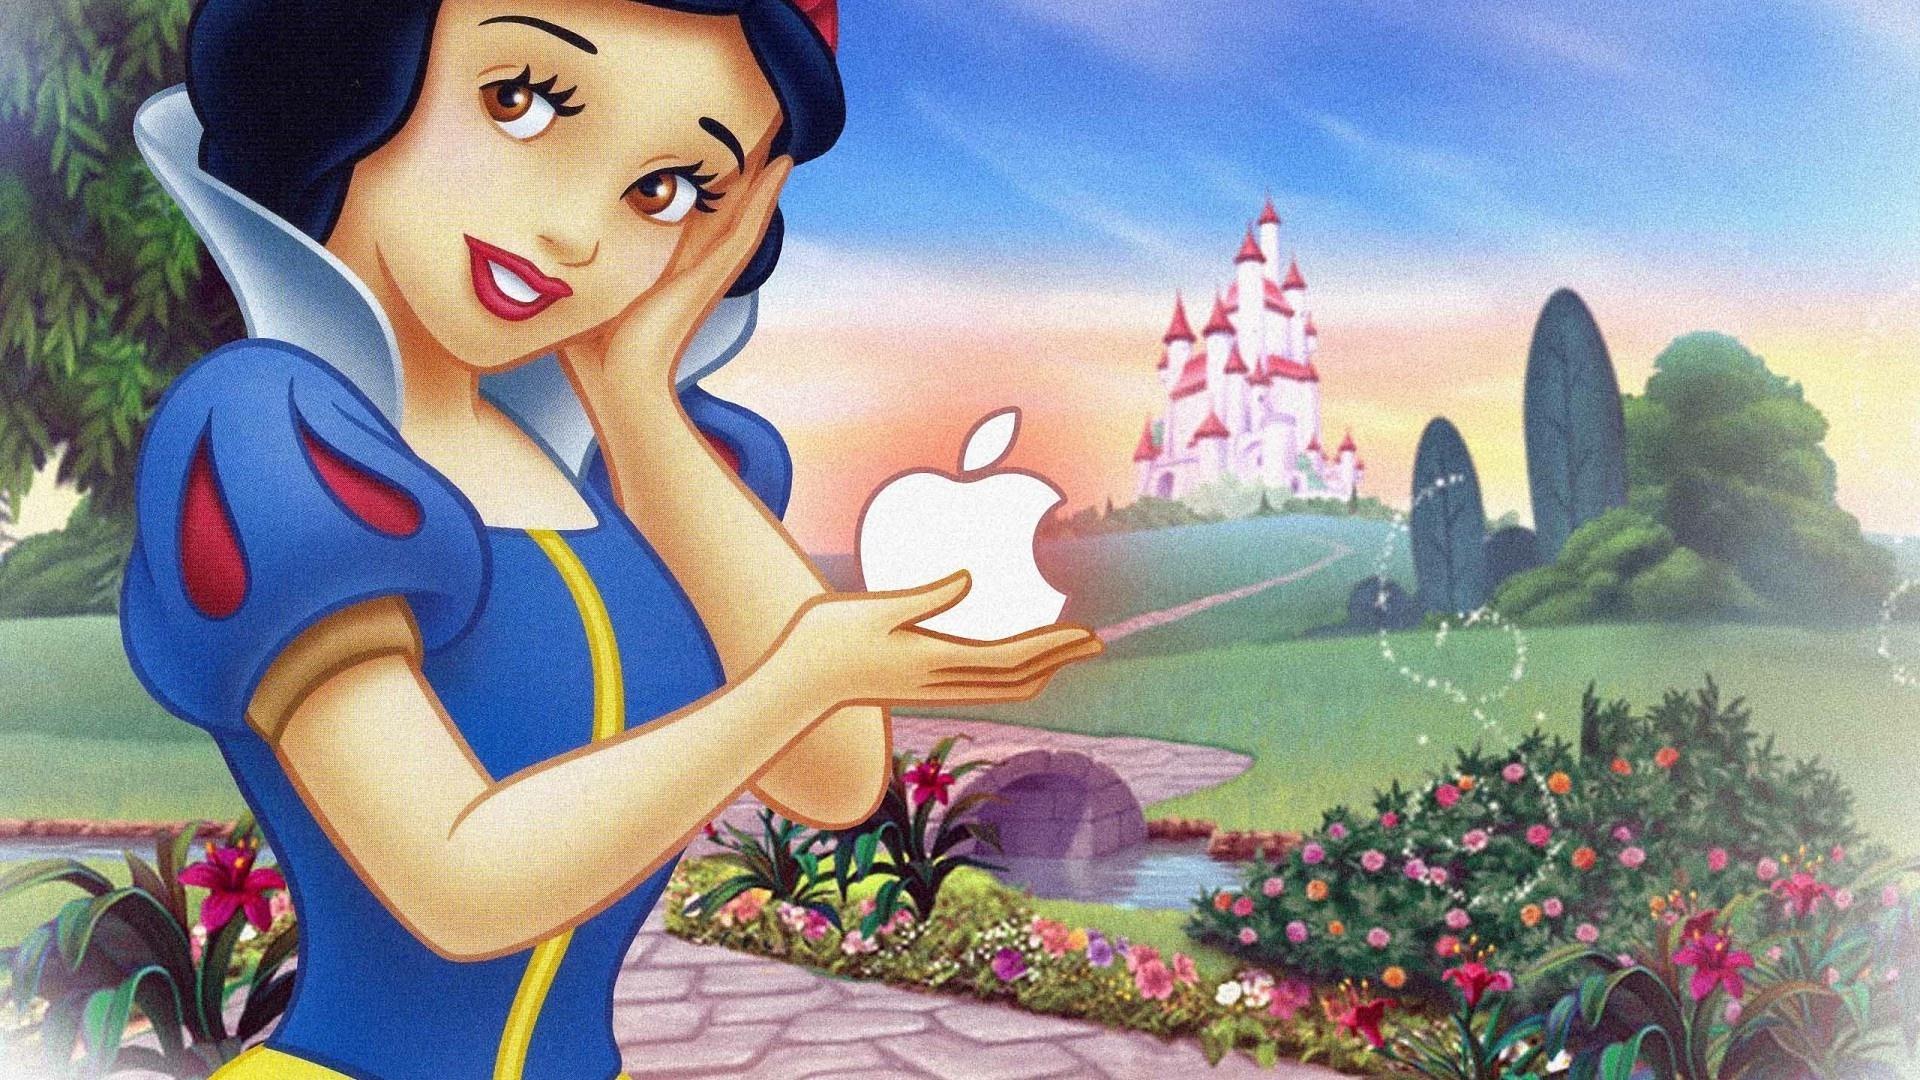 Disney laptop wallpaper